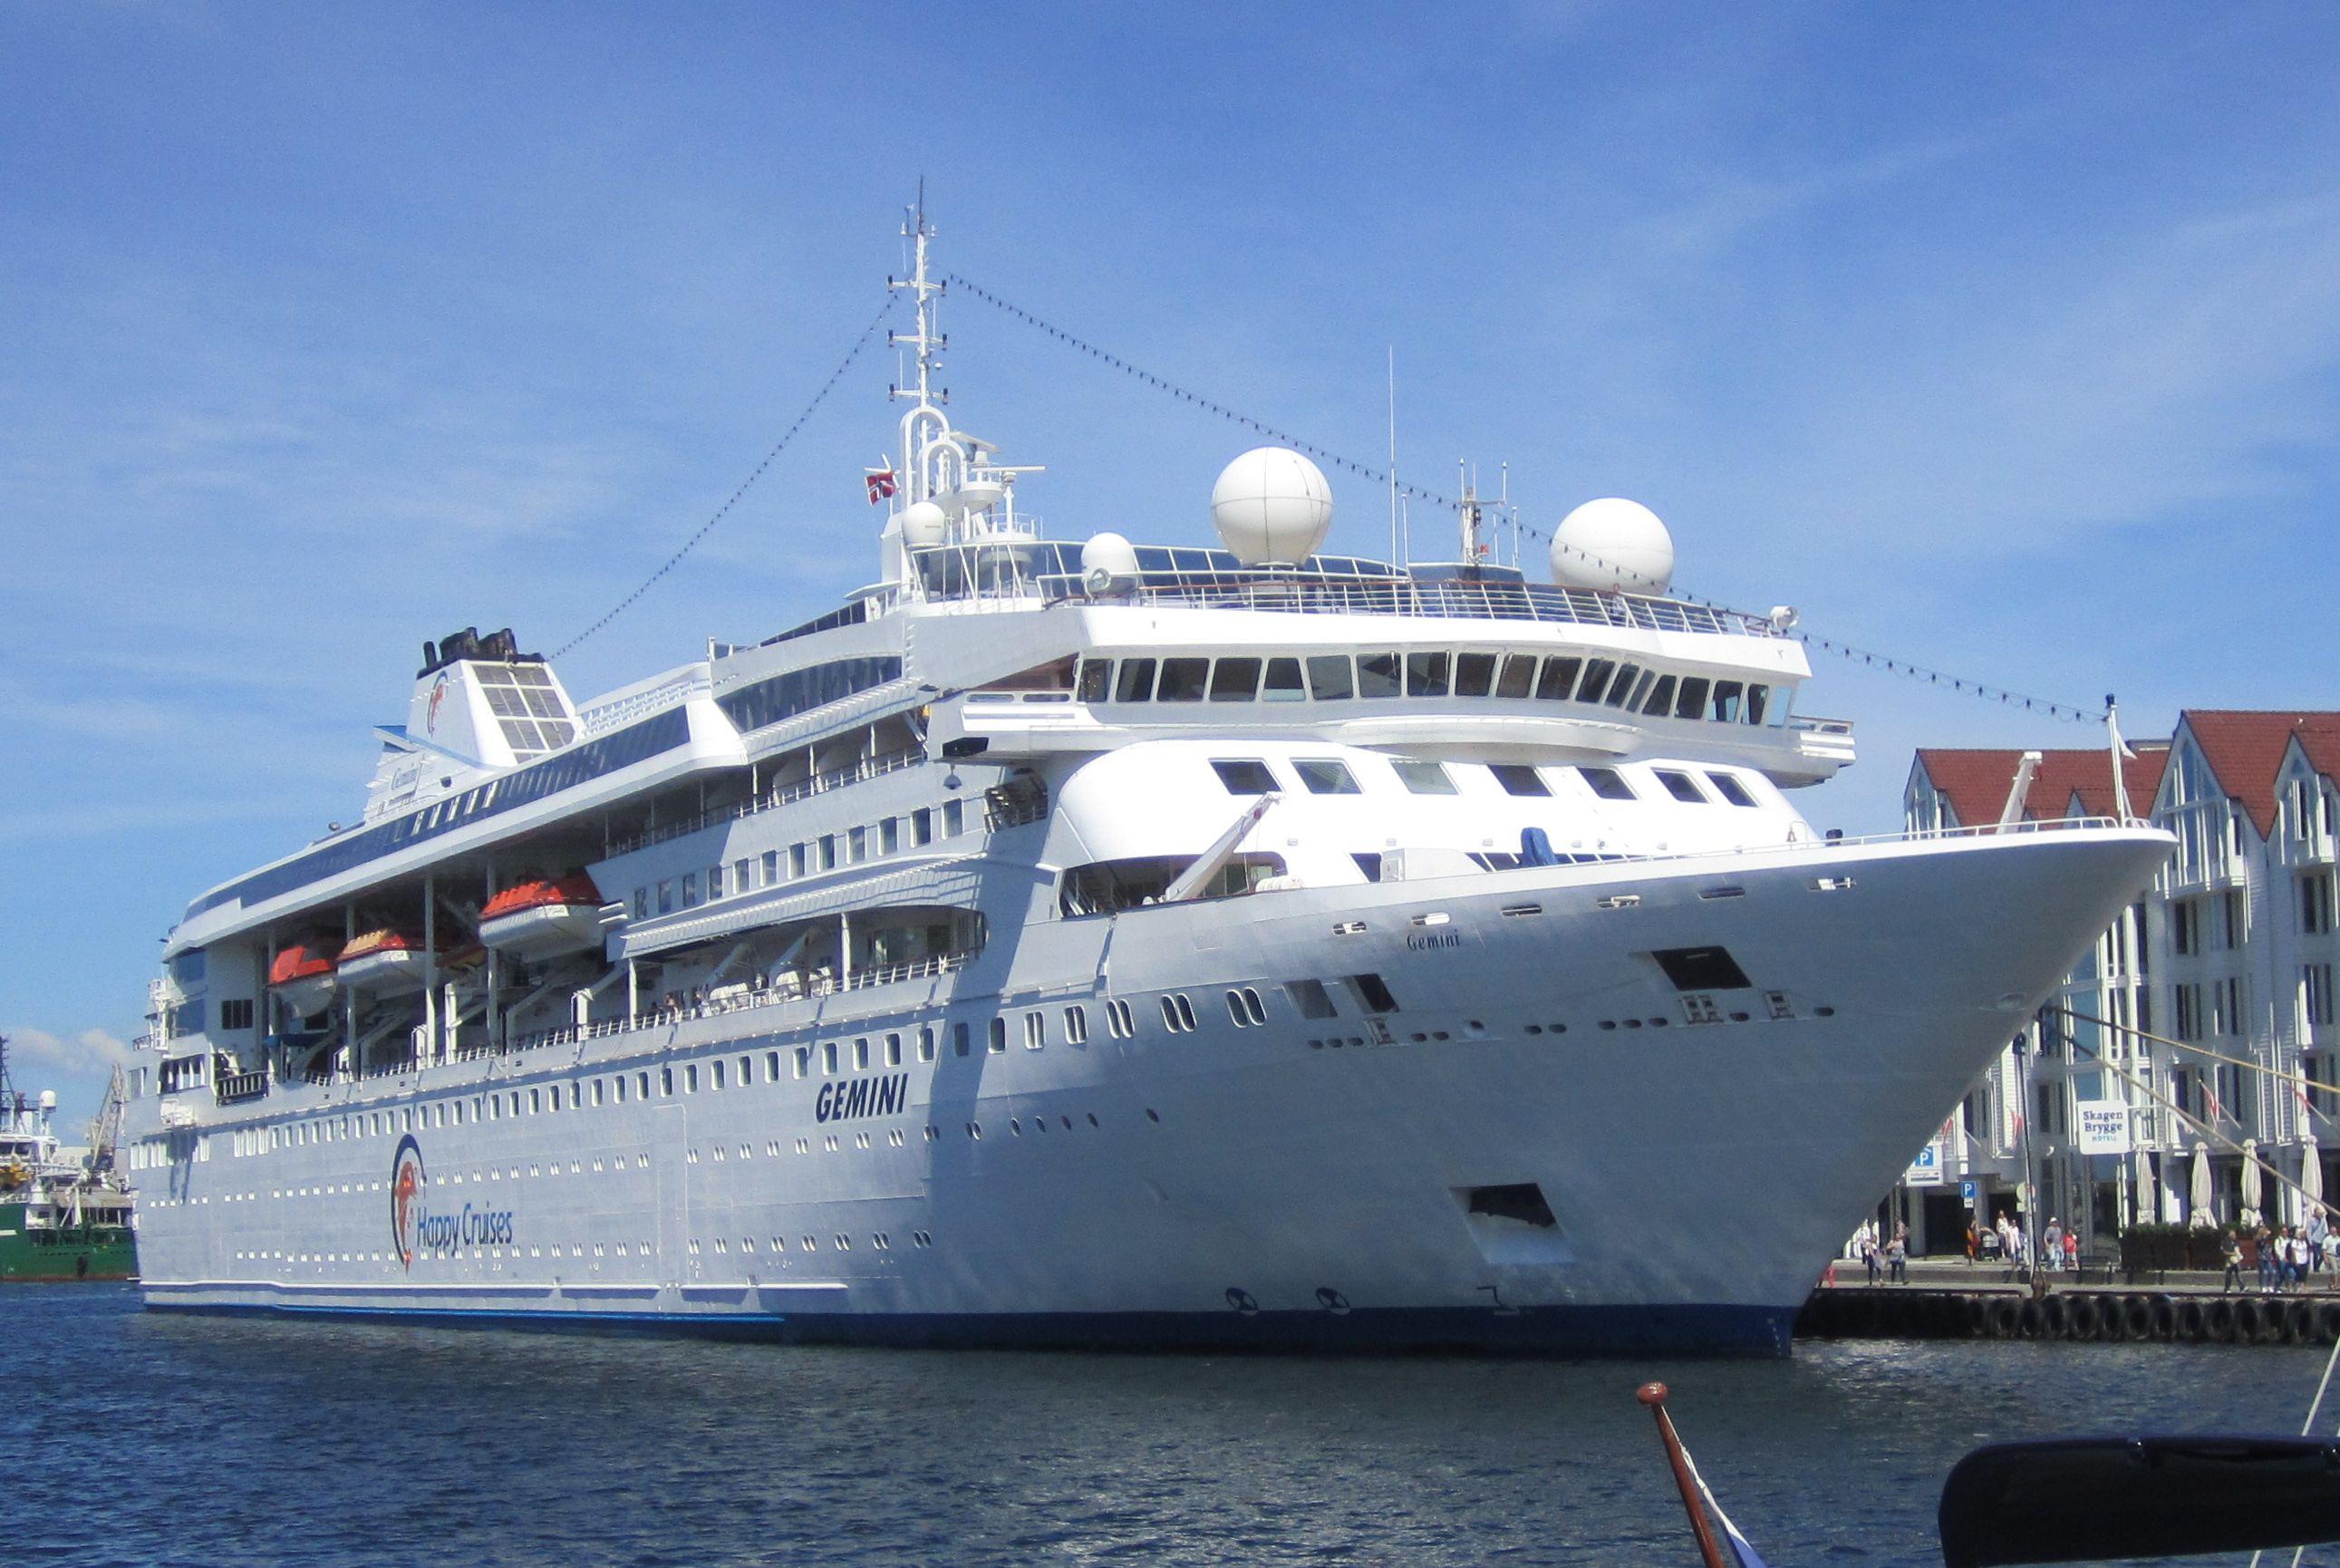 File:Gemini in Stavanger 2293.jpg